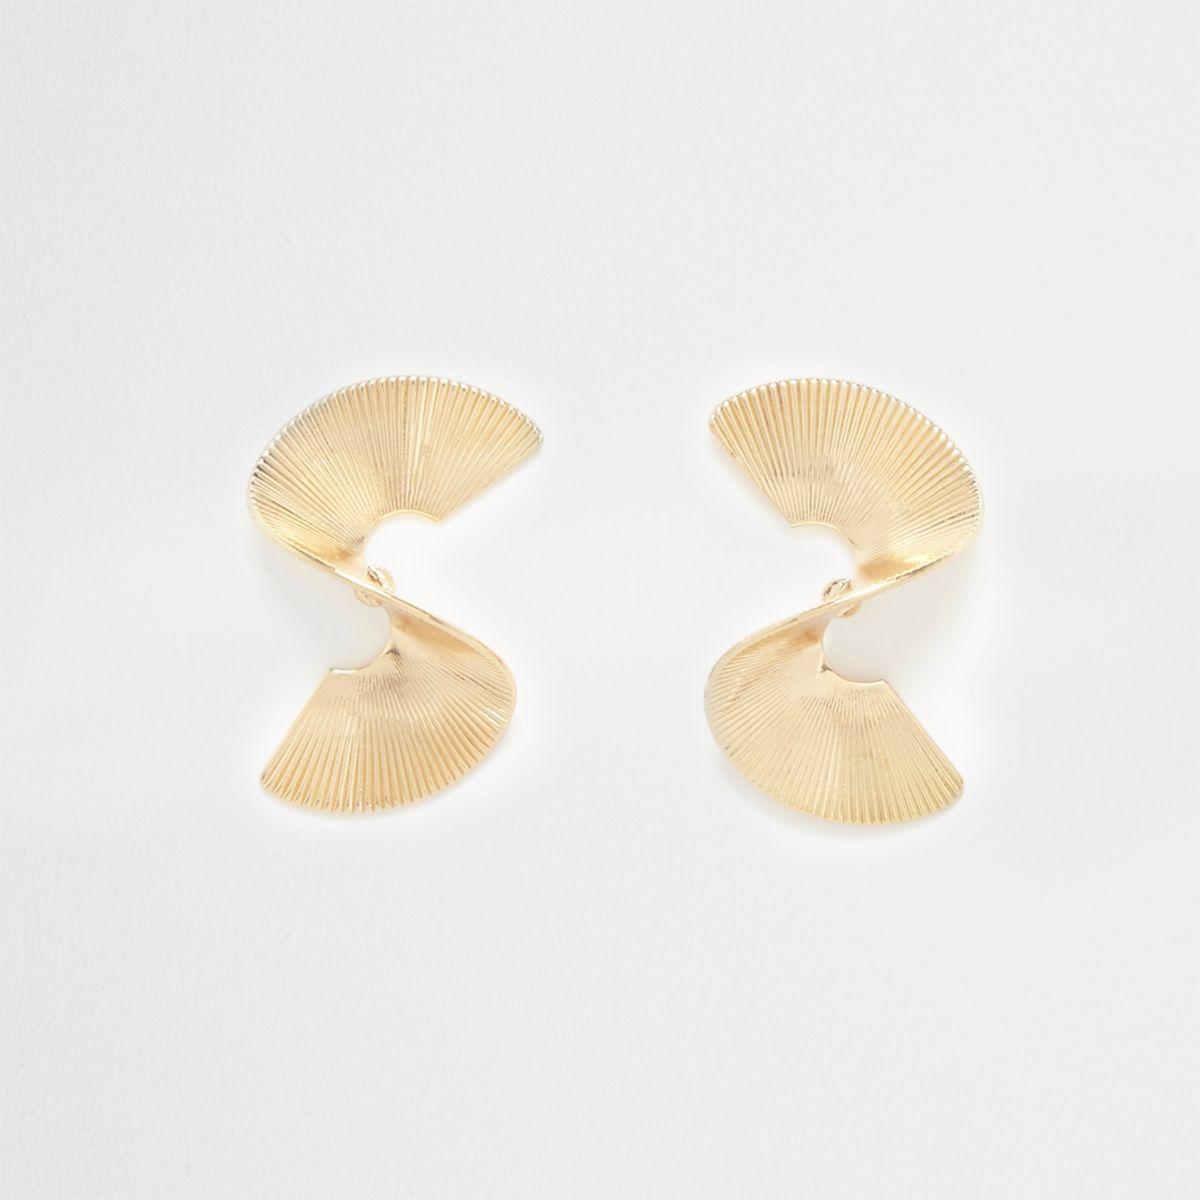 Gold tone mini twist stud earrings